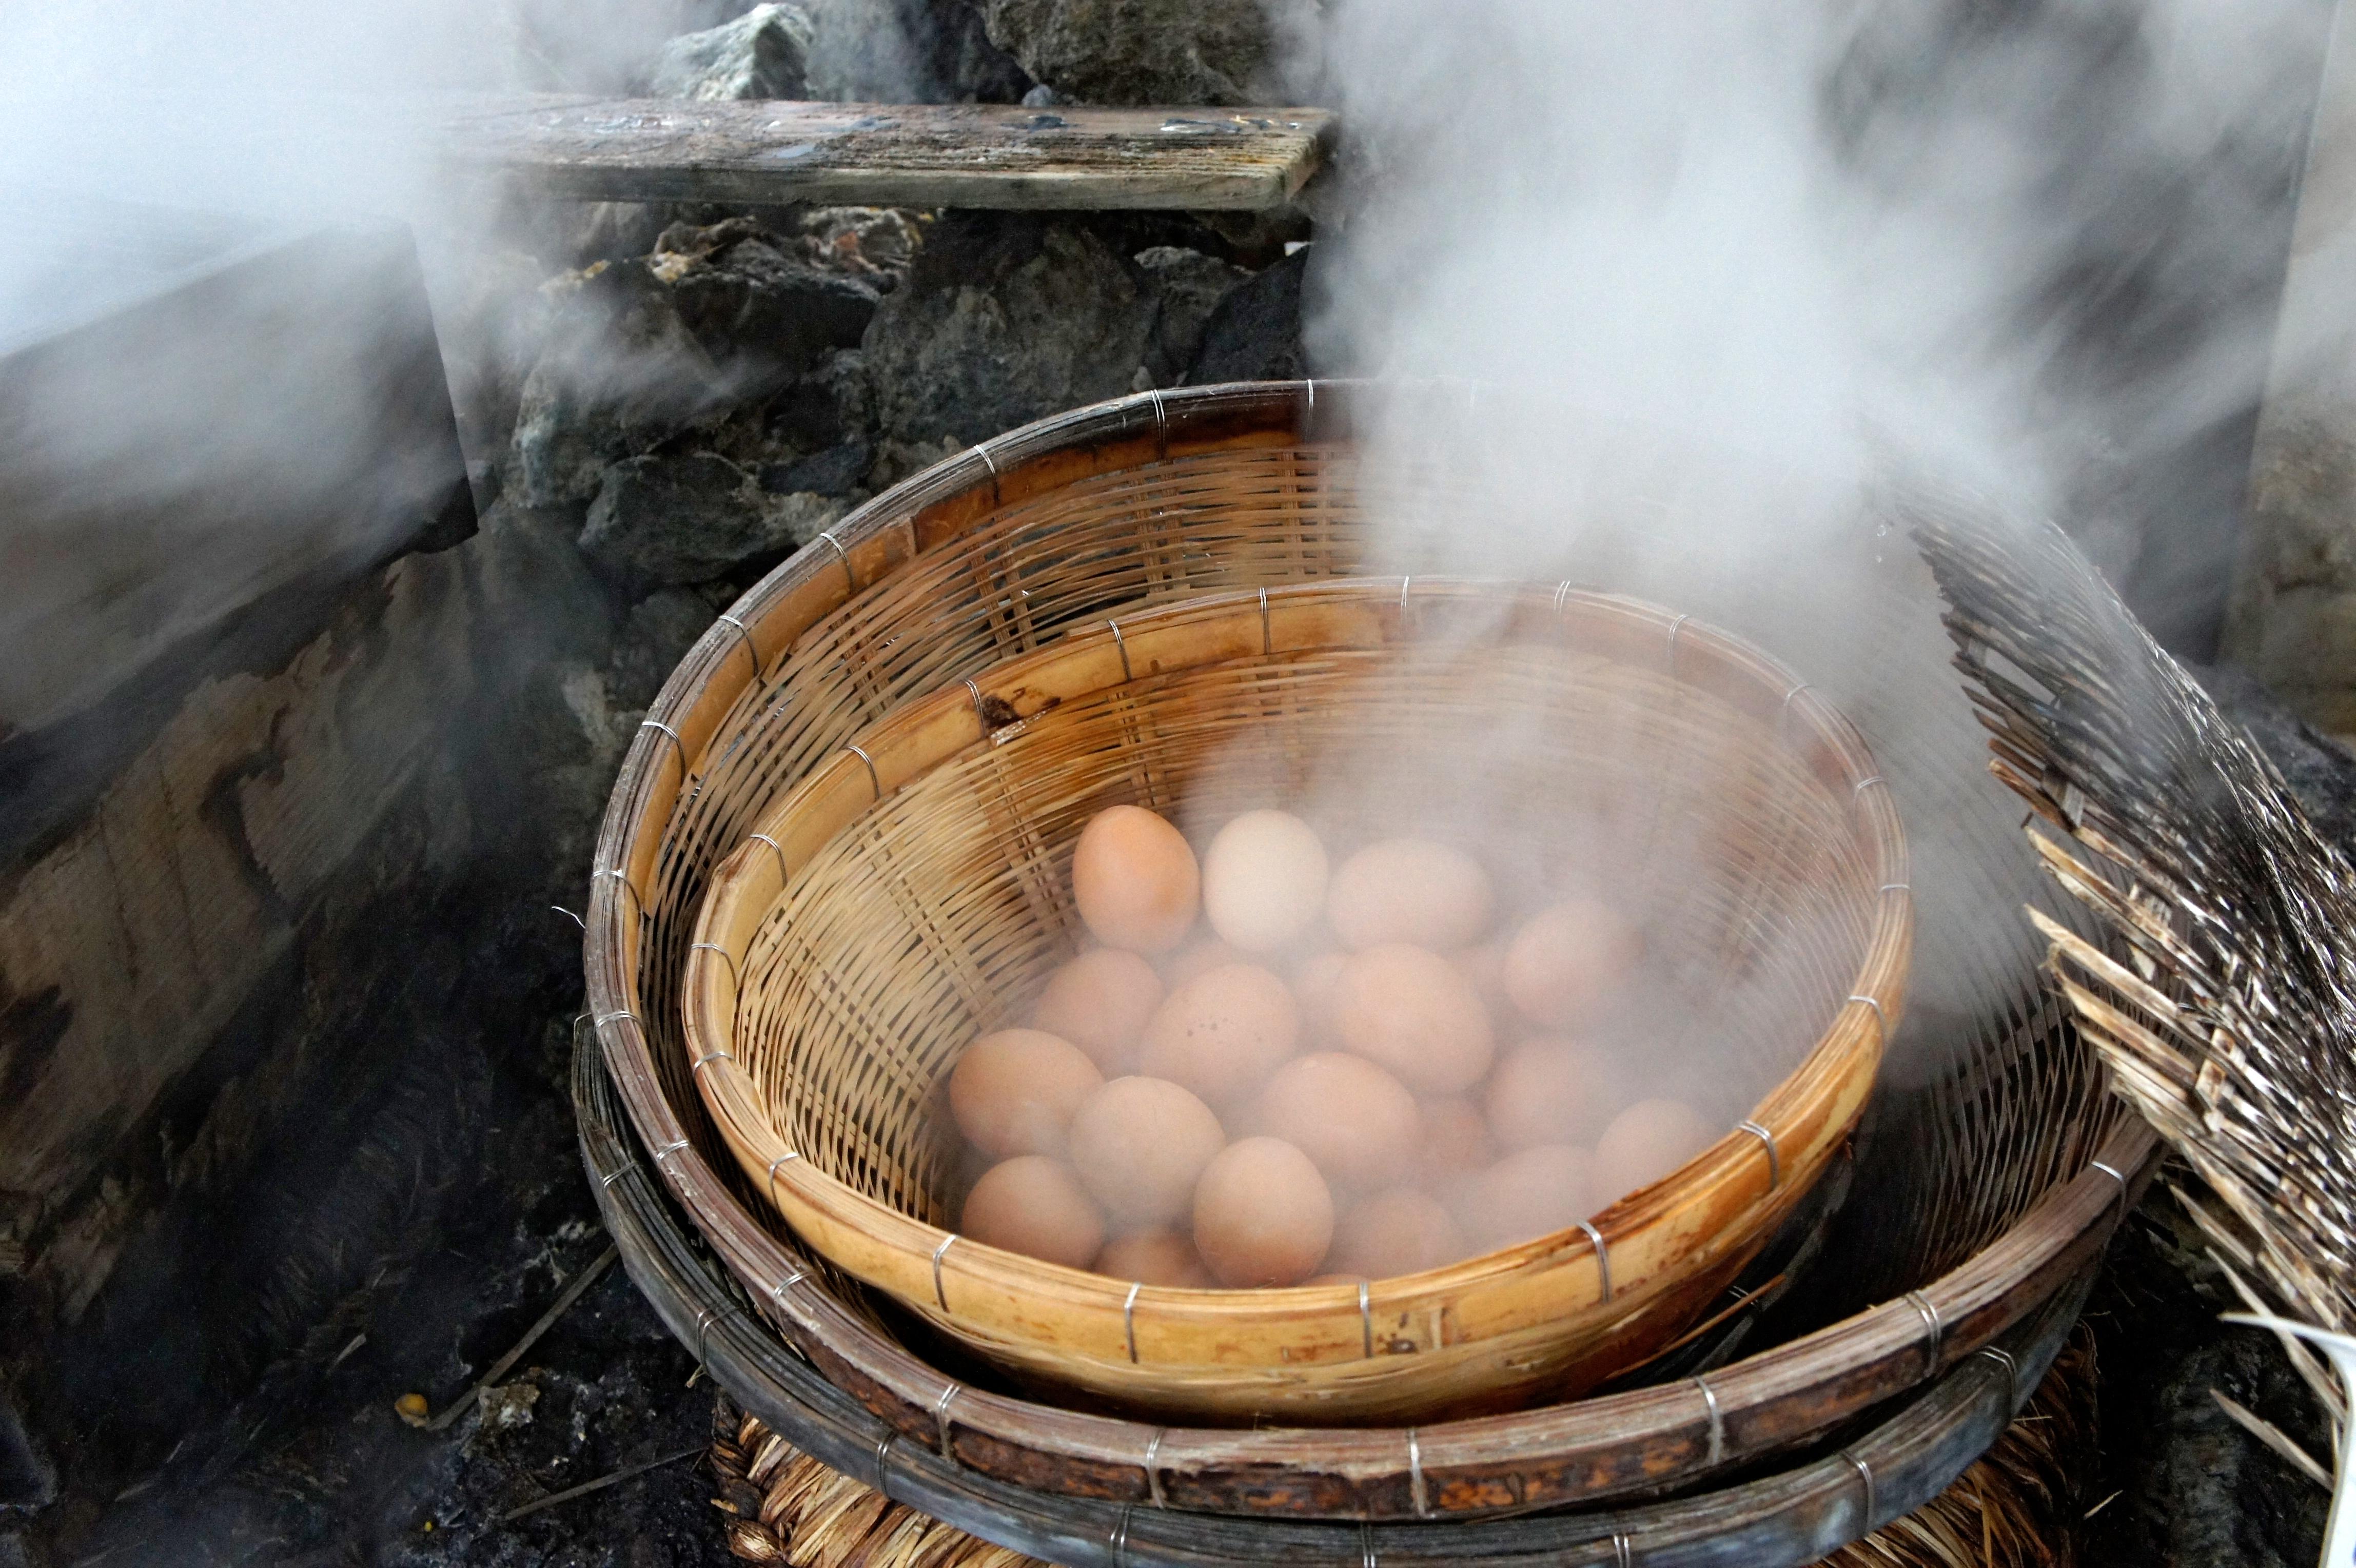 「温泉卵」の画像検索結果